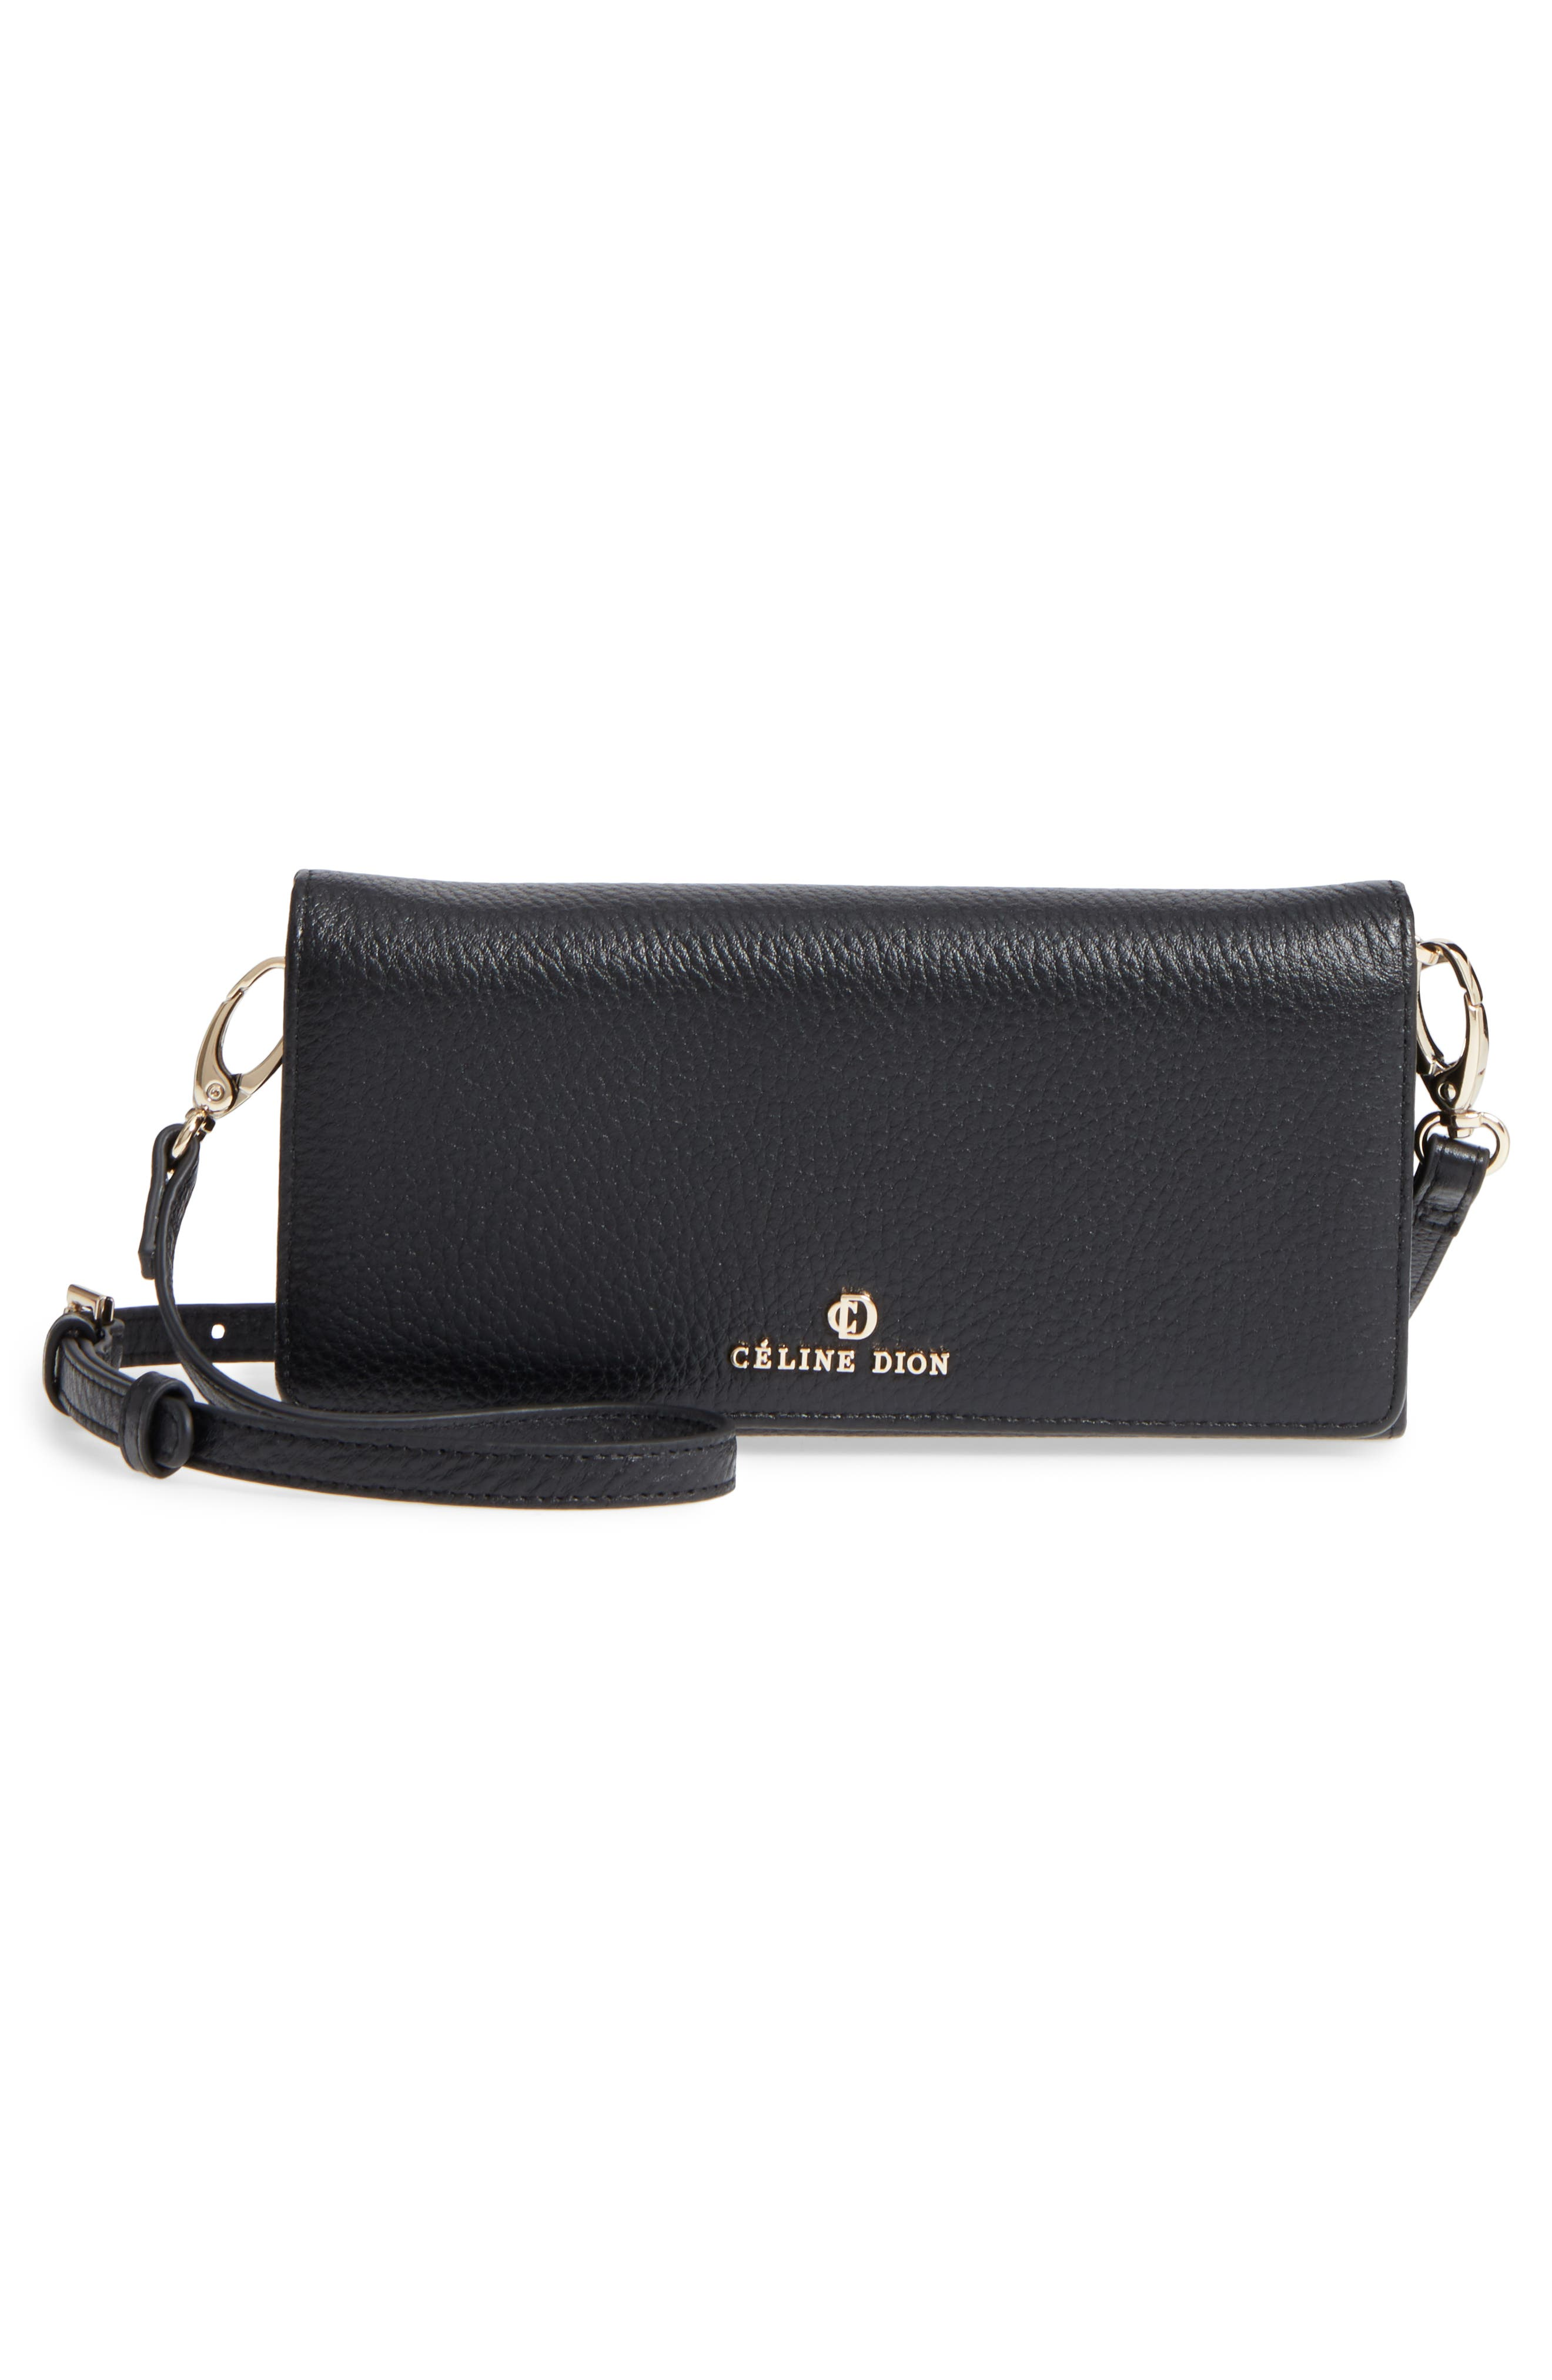 Céline Dion Adagio Leather Crossbody Wallet,                             Alternate thumbnail 3, color,                             001